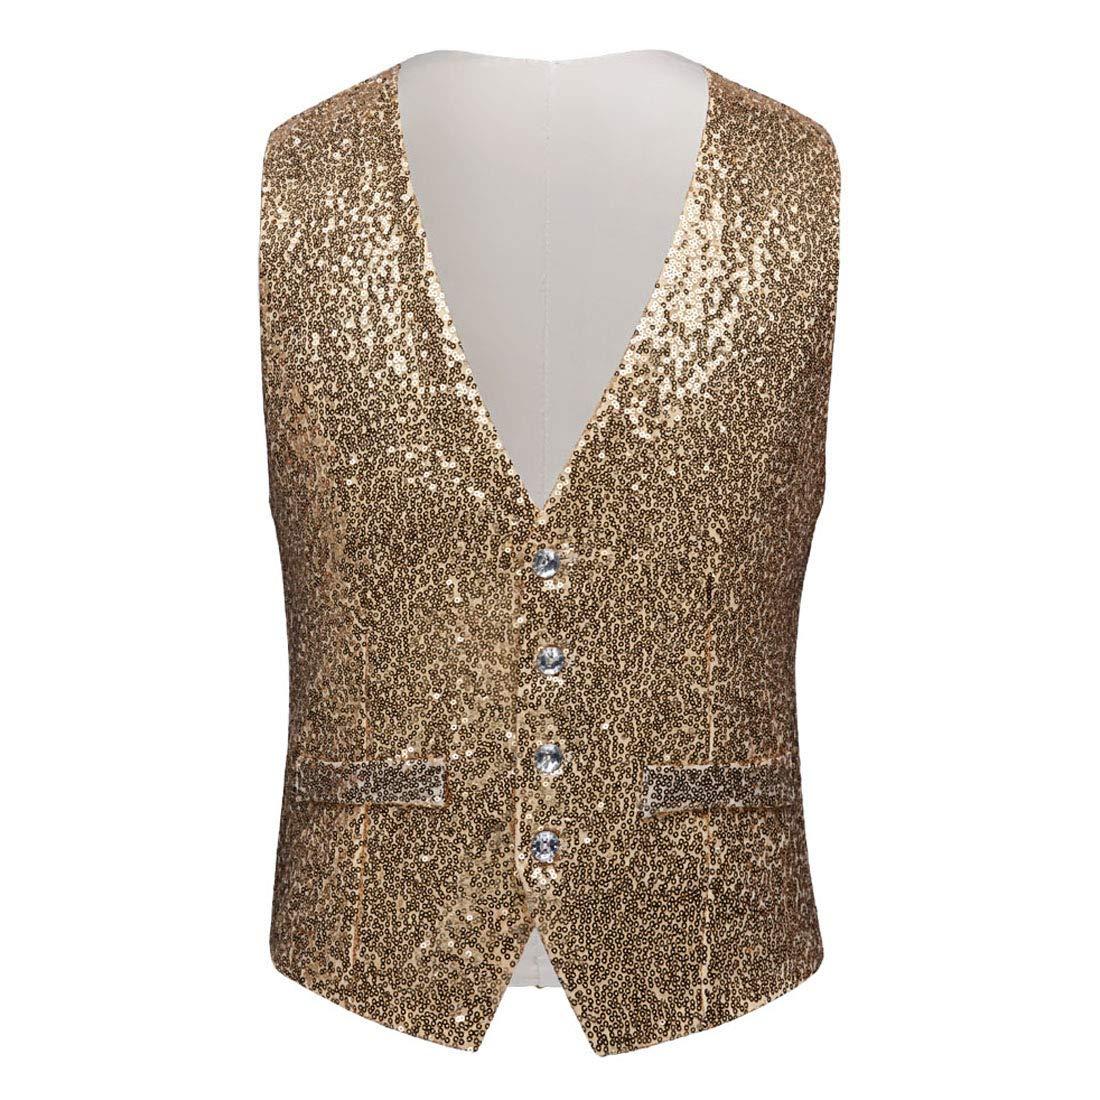 PYJTRL Mens Fashion Full Sequins Paillette Waistcoat (Gold, US 44R) by PYJTRL